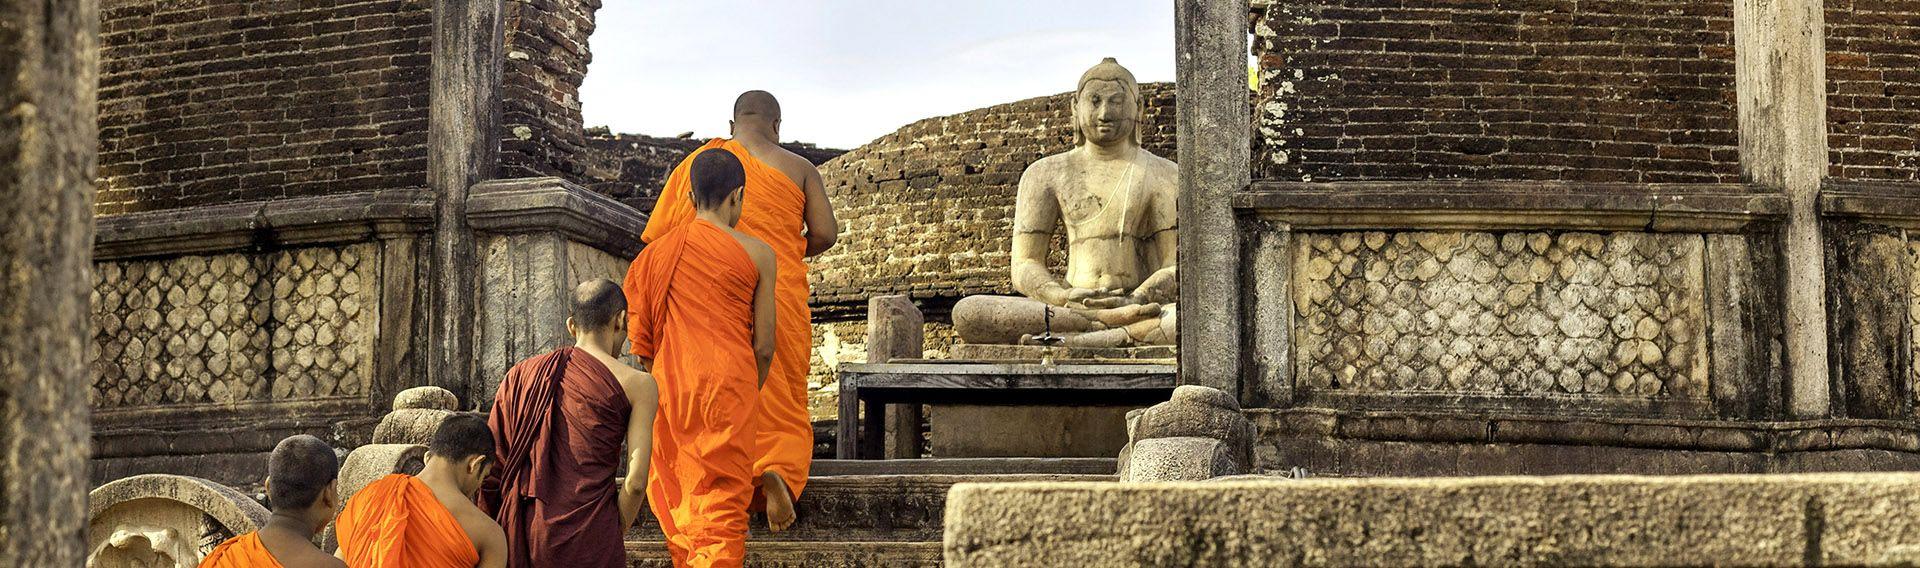 Sri Lanka, Triangle Culturel, cité historique de Polonnaruwa